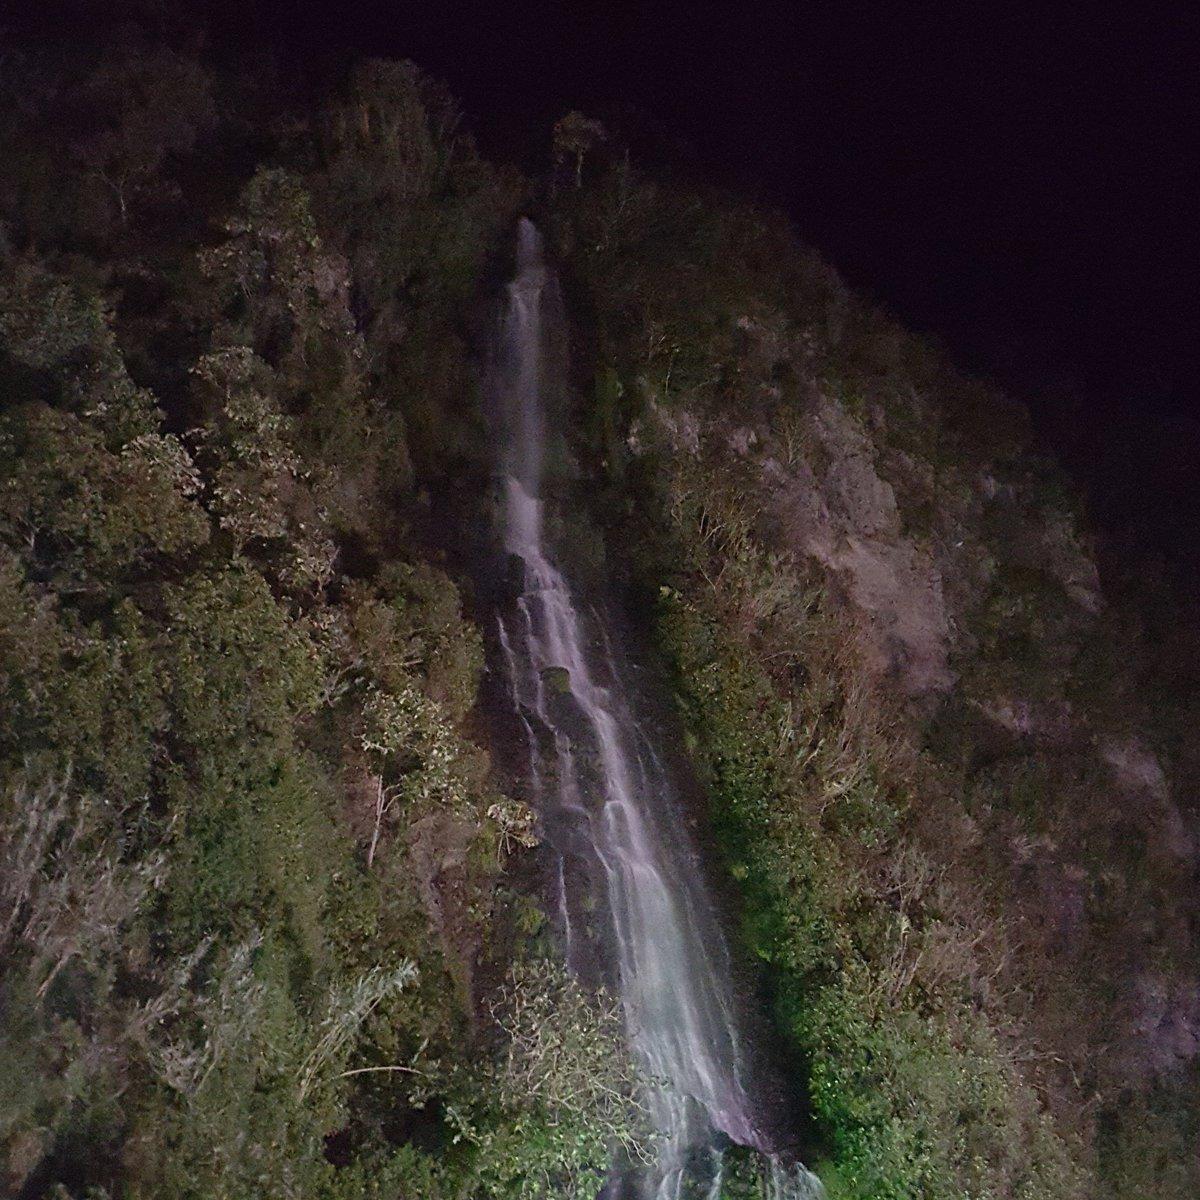 Enjoying the sound &amp; beauty of this waterfall at night   #Travel #adventure #Ecuador <br>http://pic.twitter.com/lJRtUAg8xz